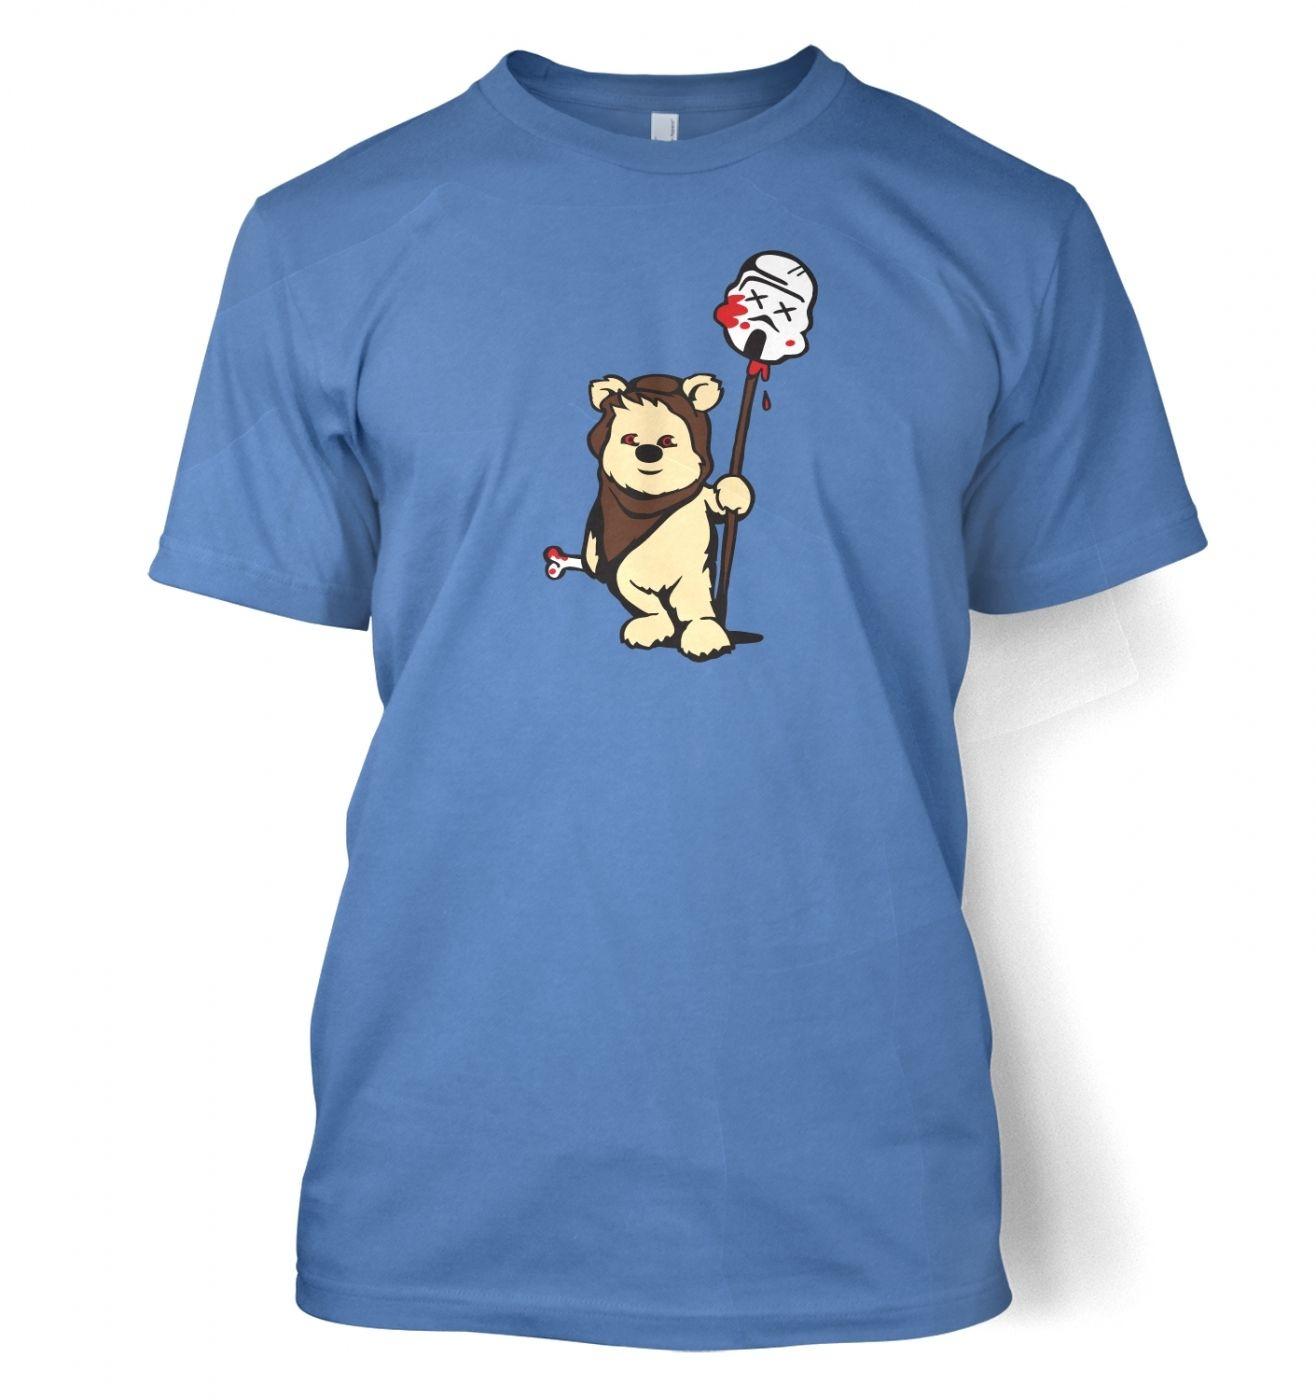 Evil Ewok T-Shirt - Inspired by Star Wars